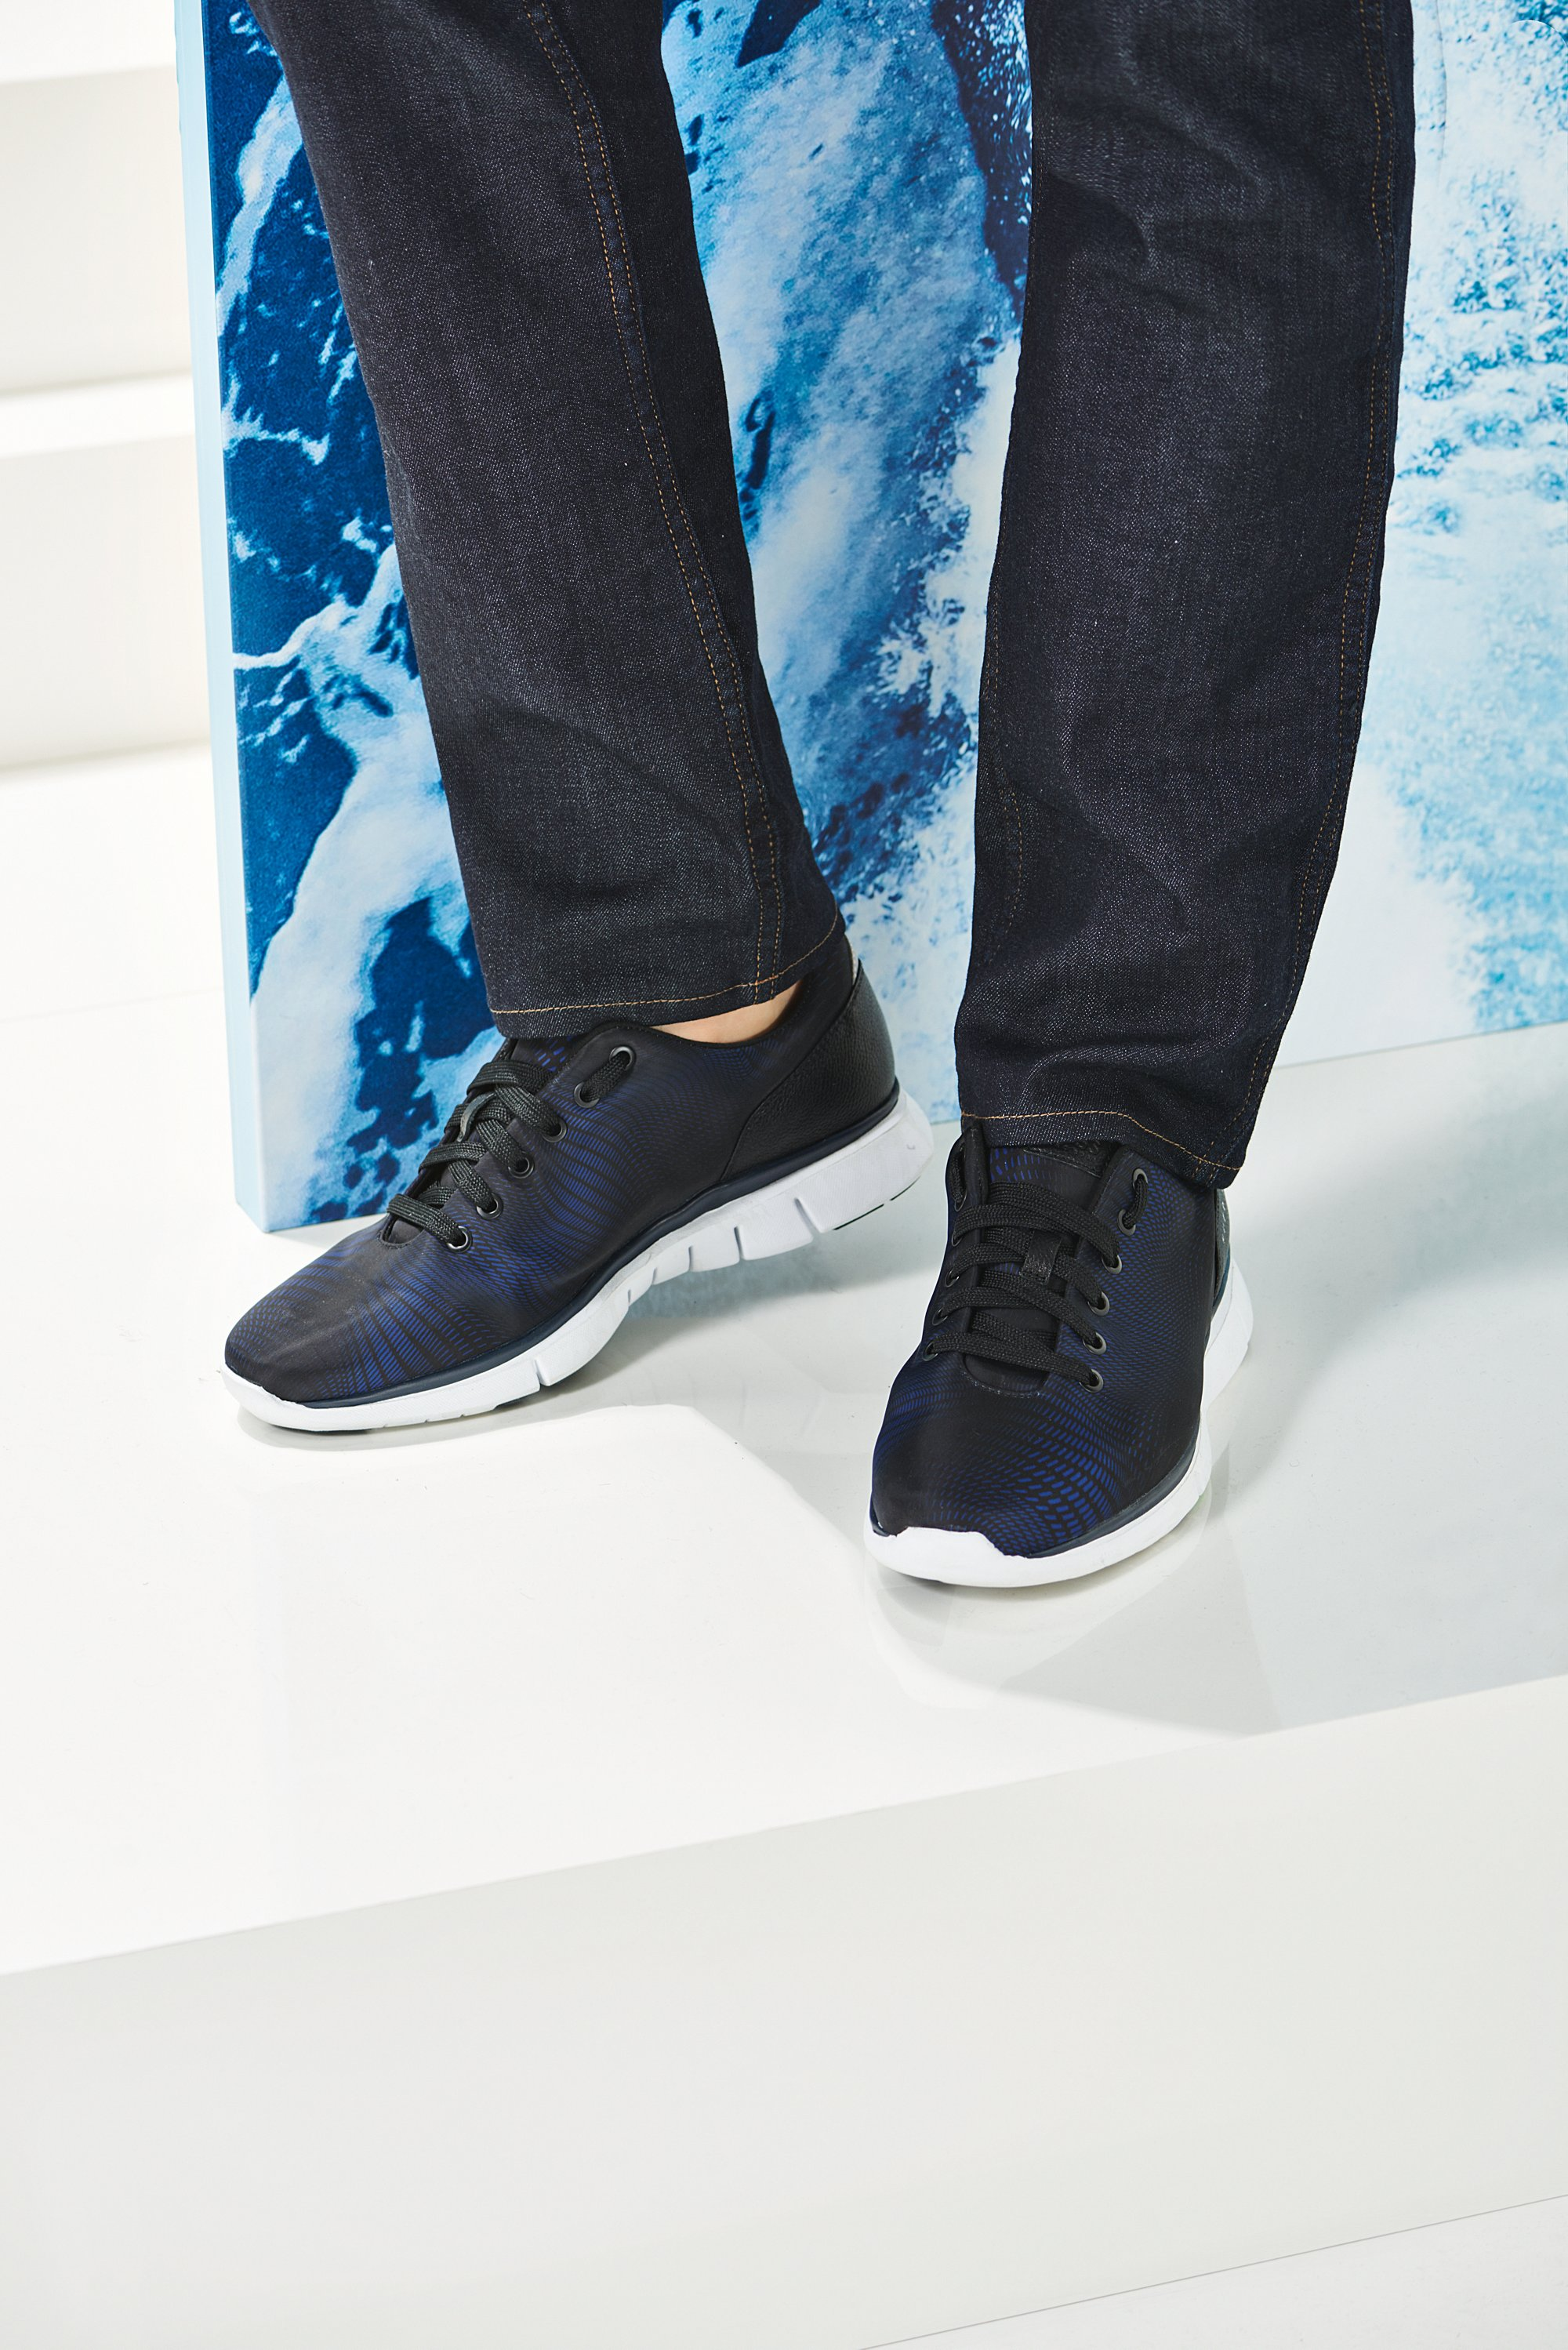 Schuhe von BOSS Green Menswear